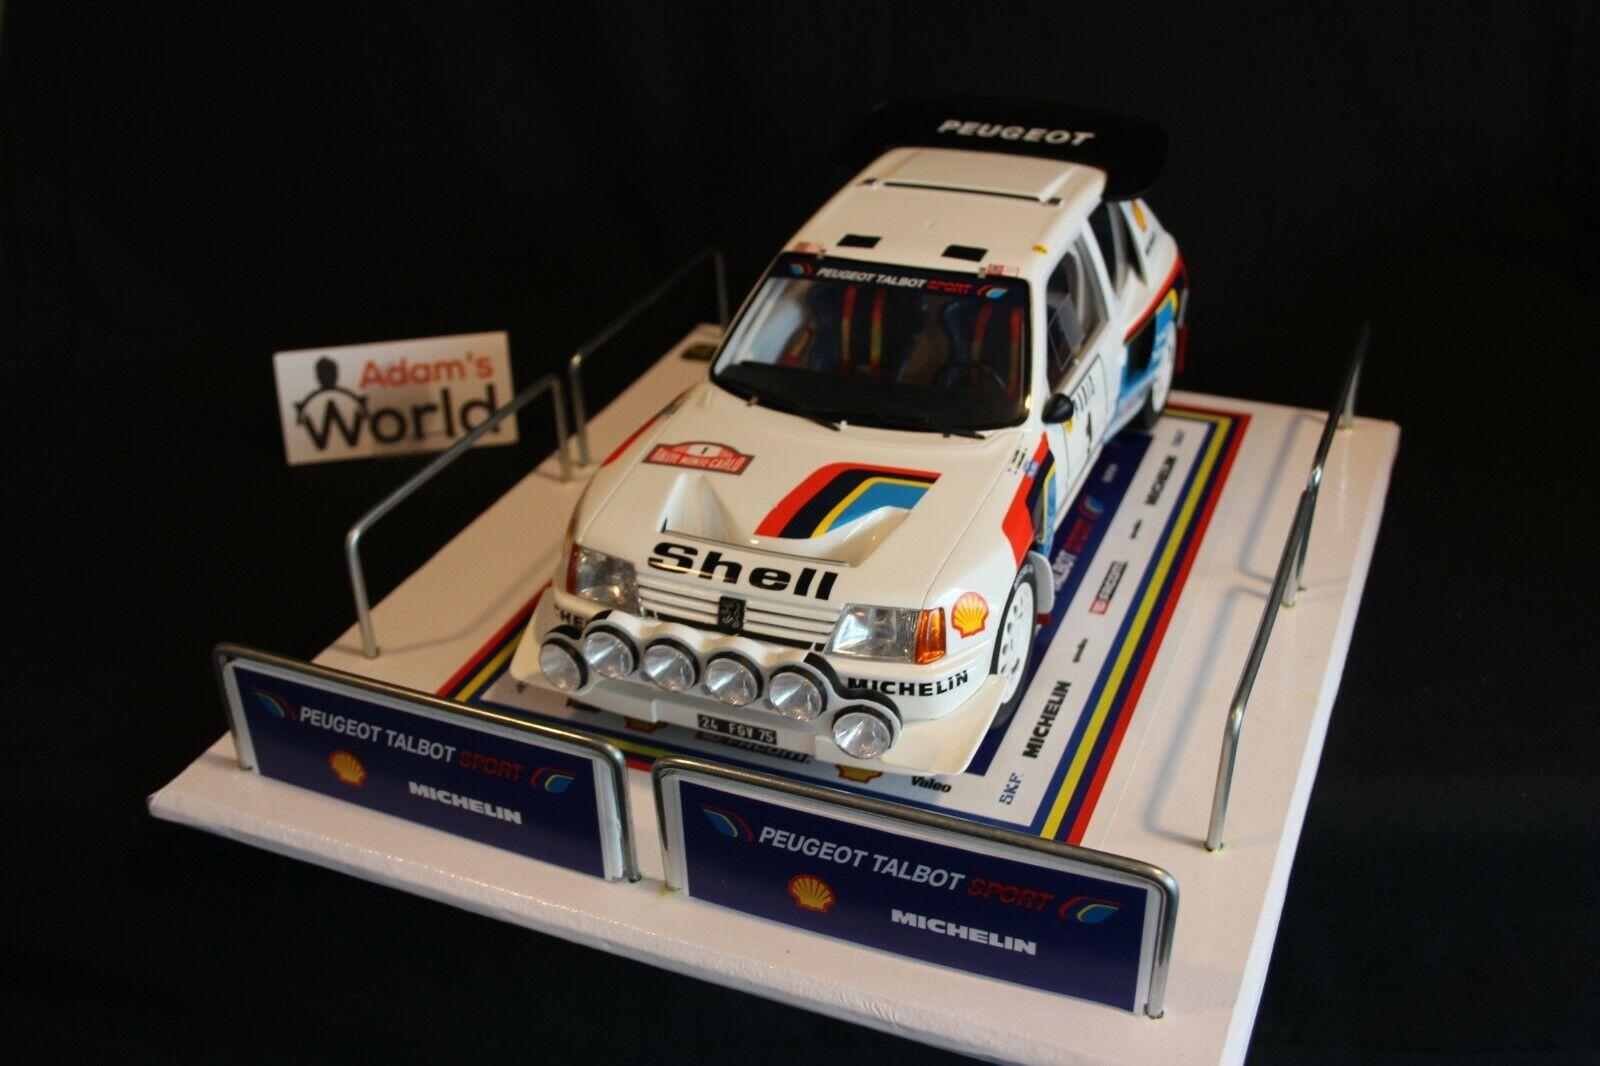 grandes precios de descuento QSP Diorama 1 12     1 18 Peugeot Talbot Sport Rally Team Service  autorización